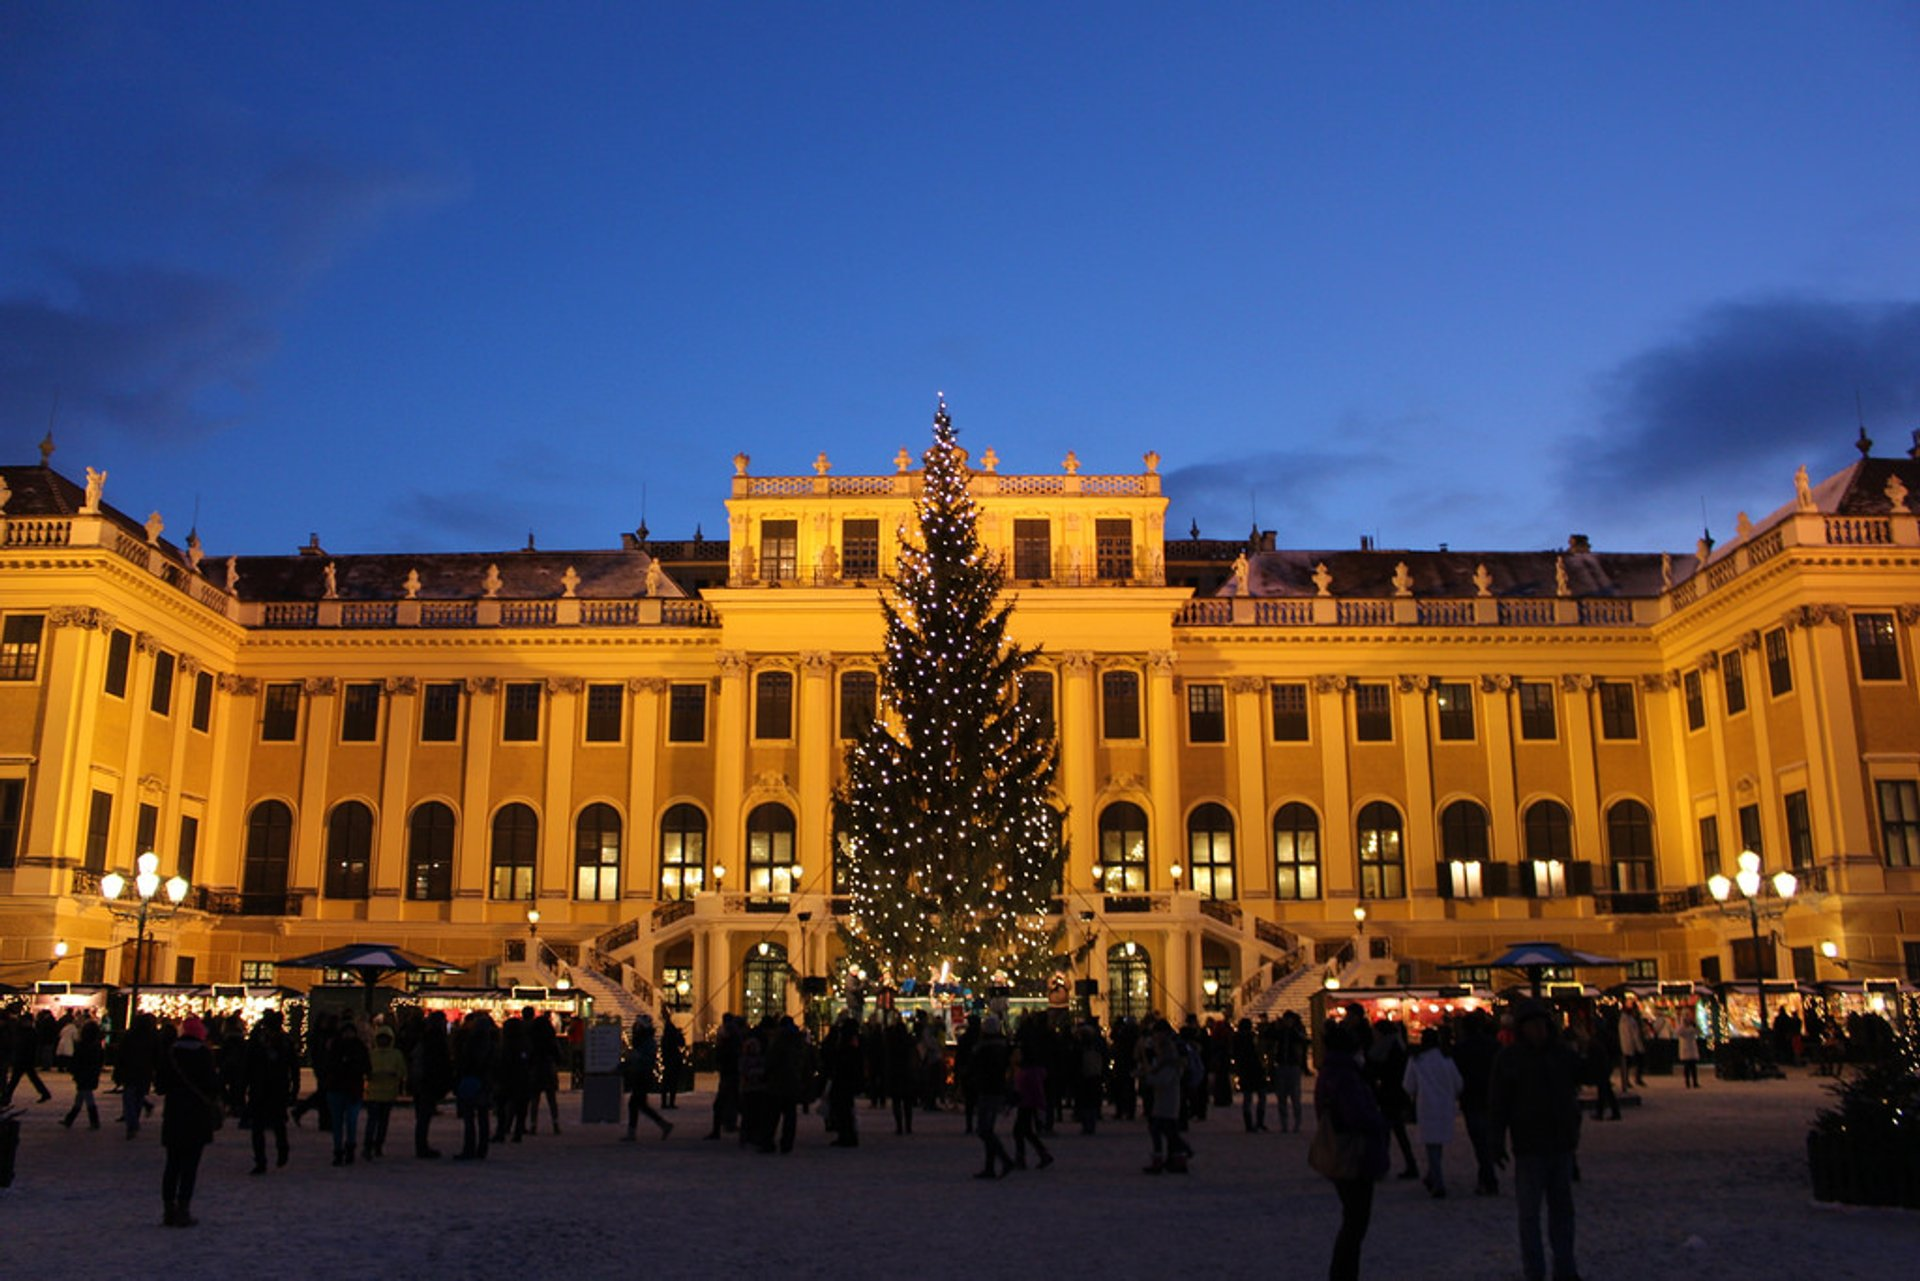 Christmas Market at Schönbrunn Palace  2019